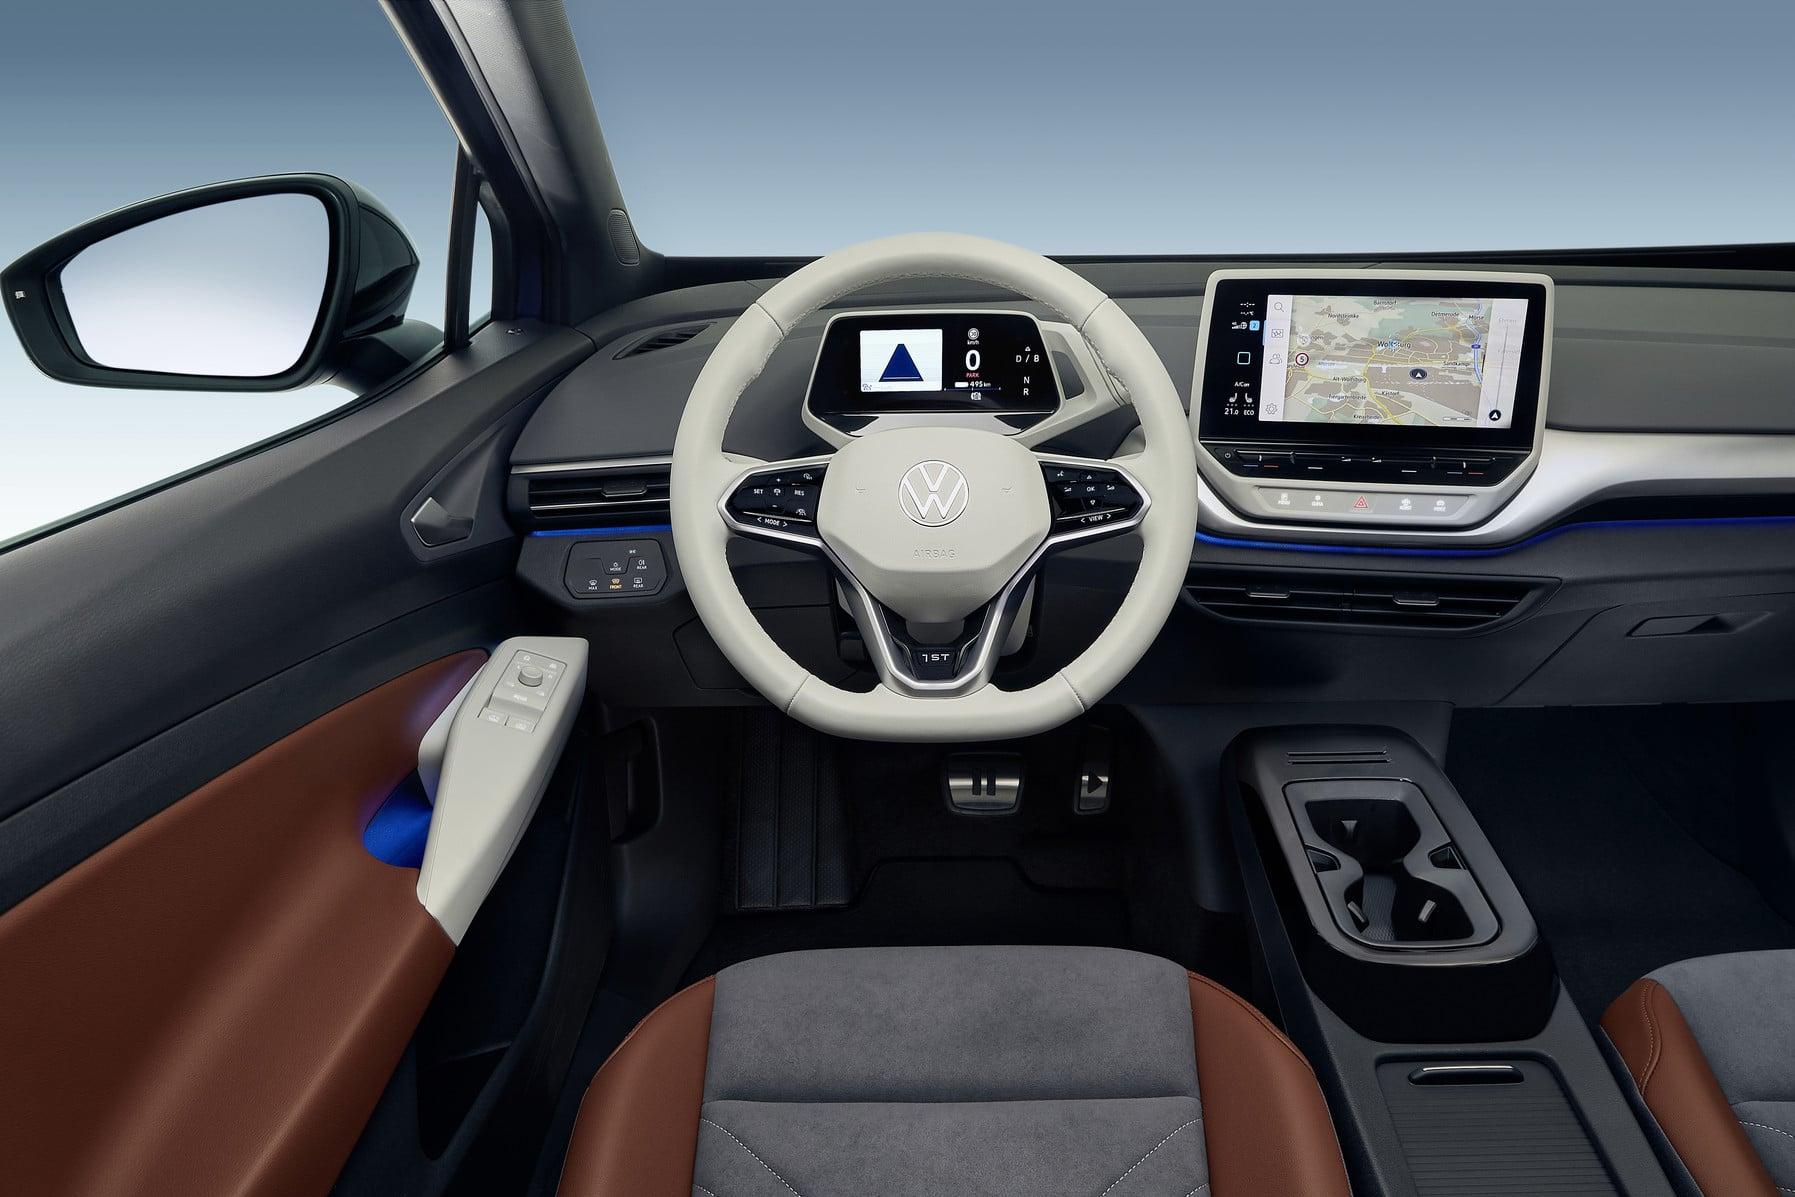 Steering Wheel Console of The New Volkswagen ID.4